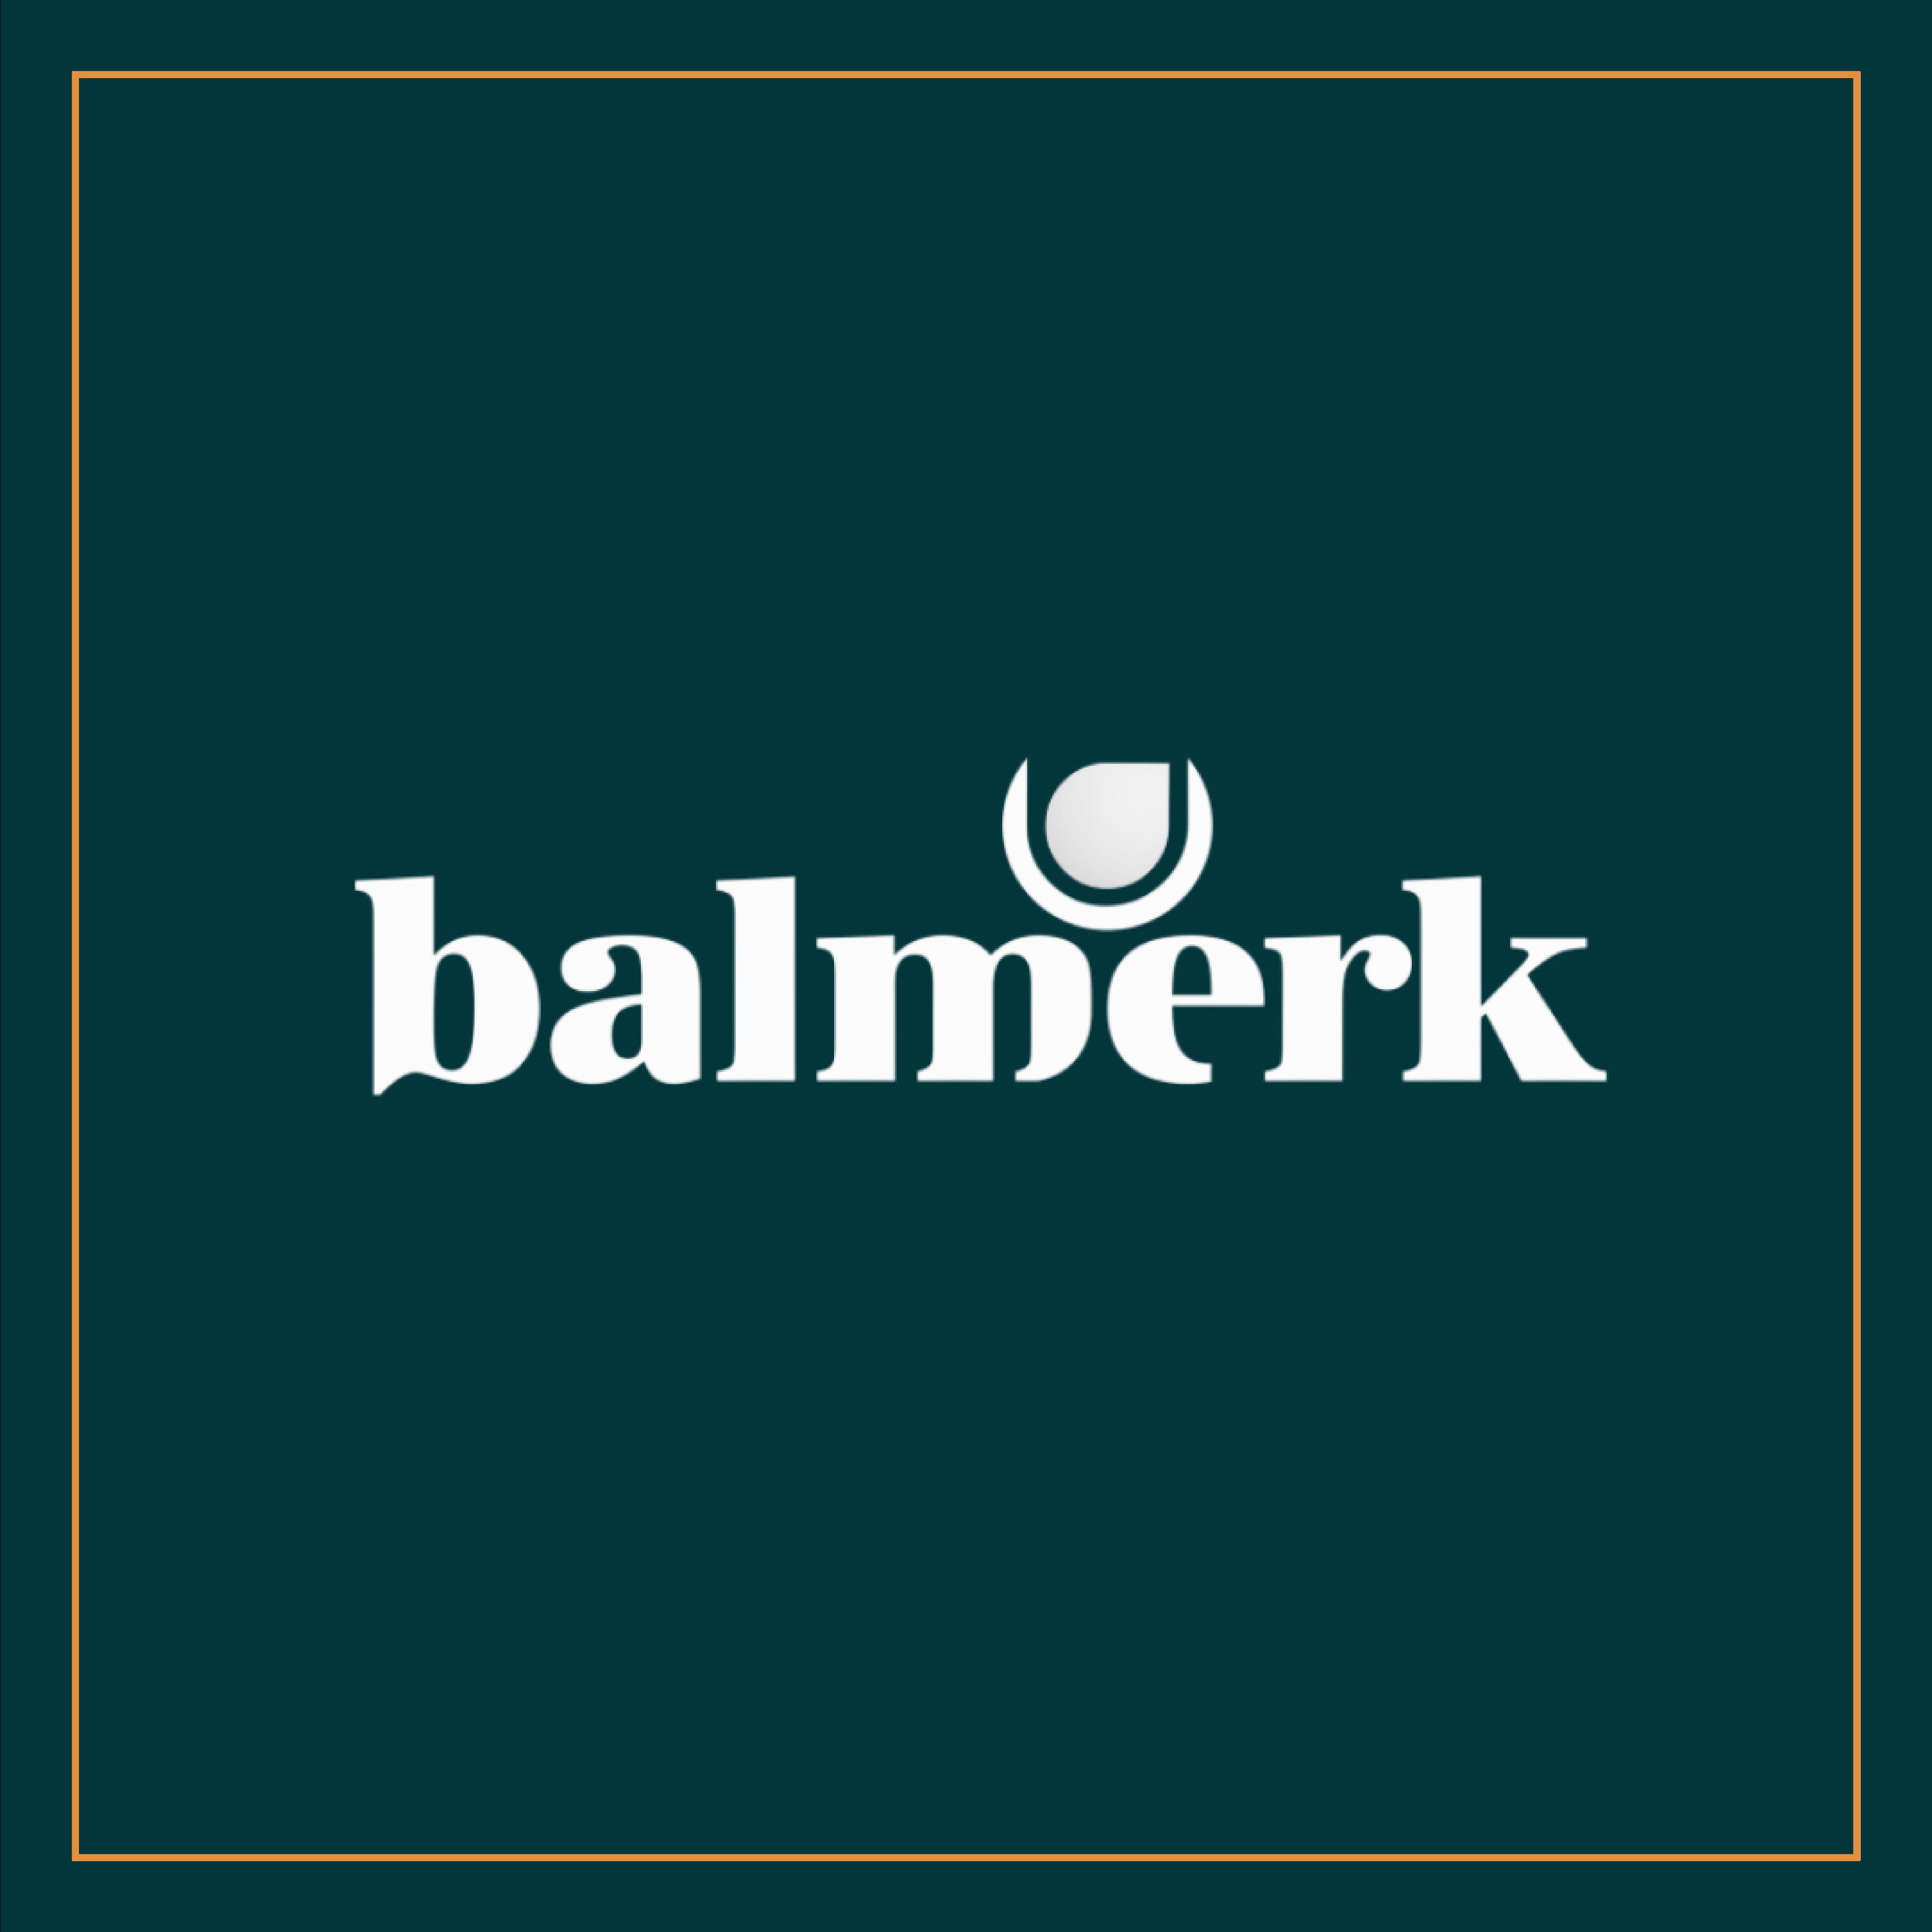 Trt_sponsorid_Balmerk